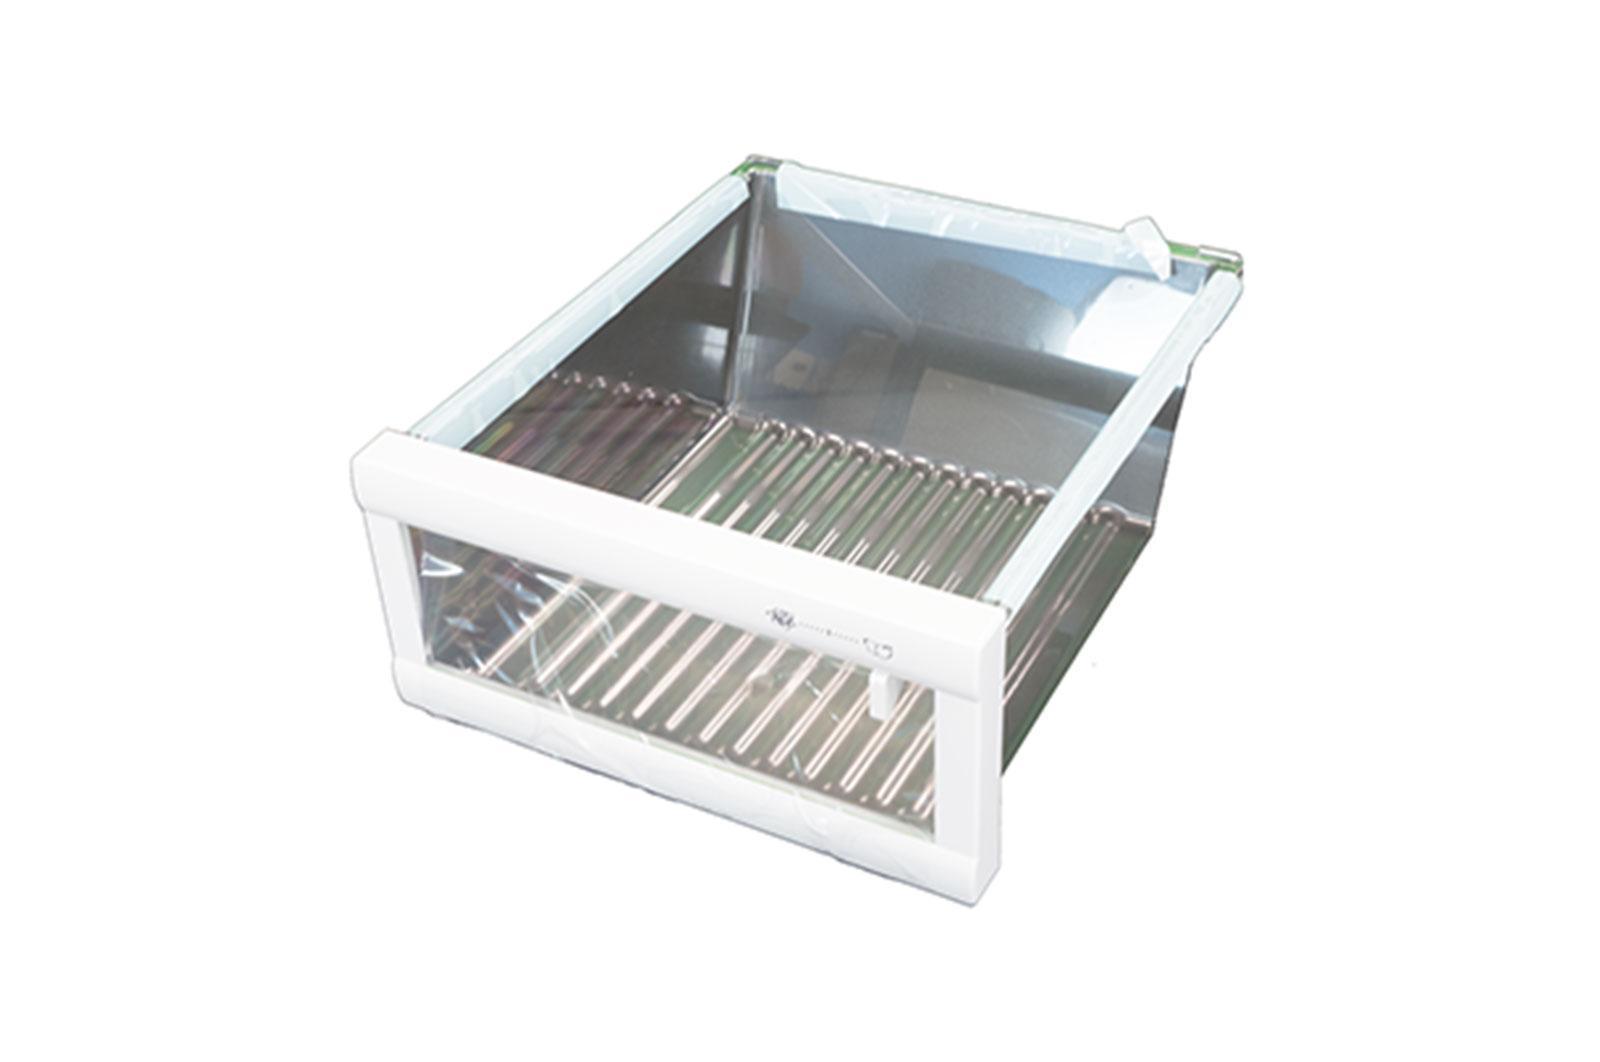 LG Refrigerator Crisper Drawer AJP32871405